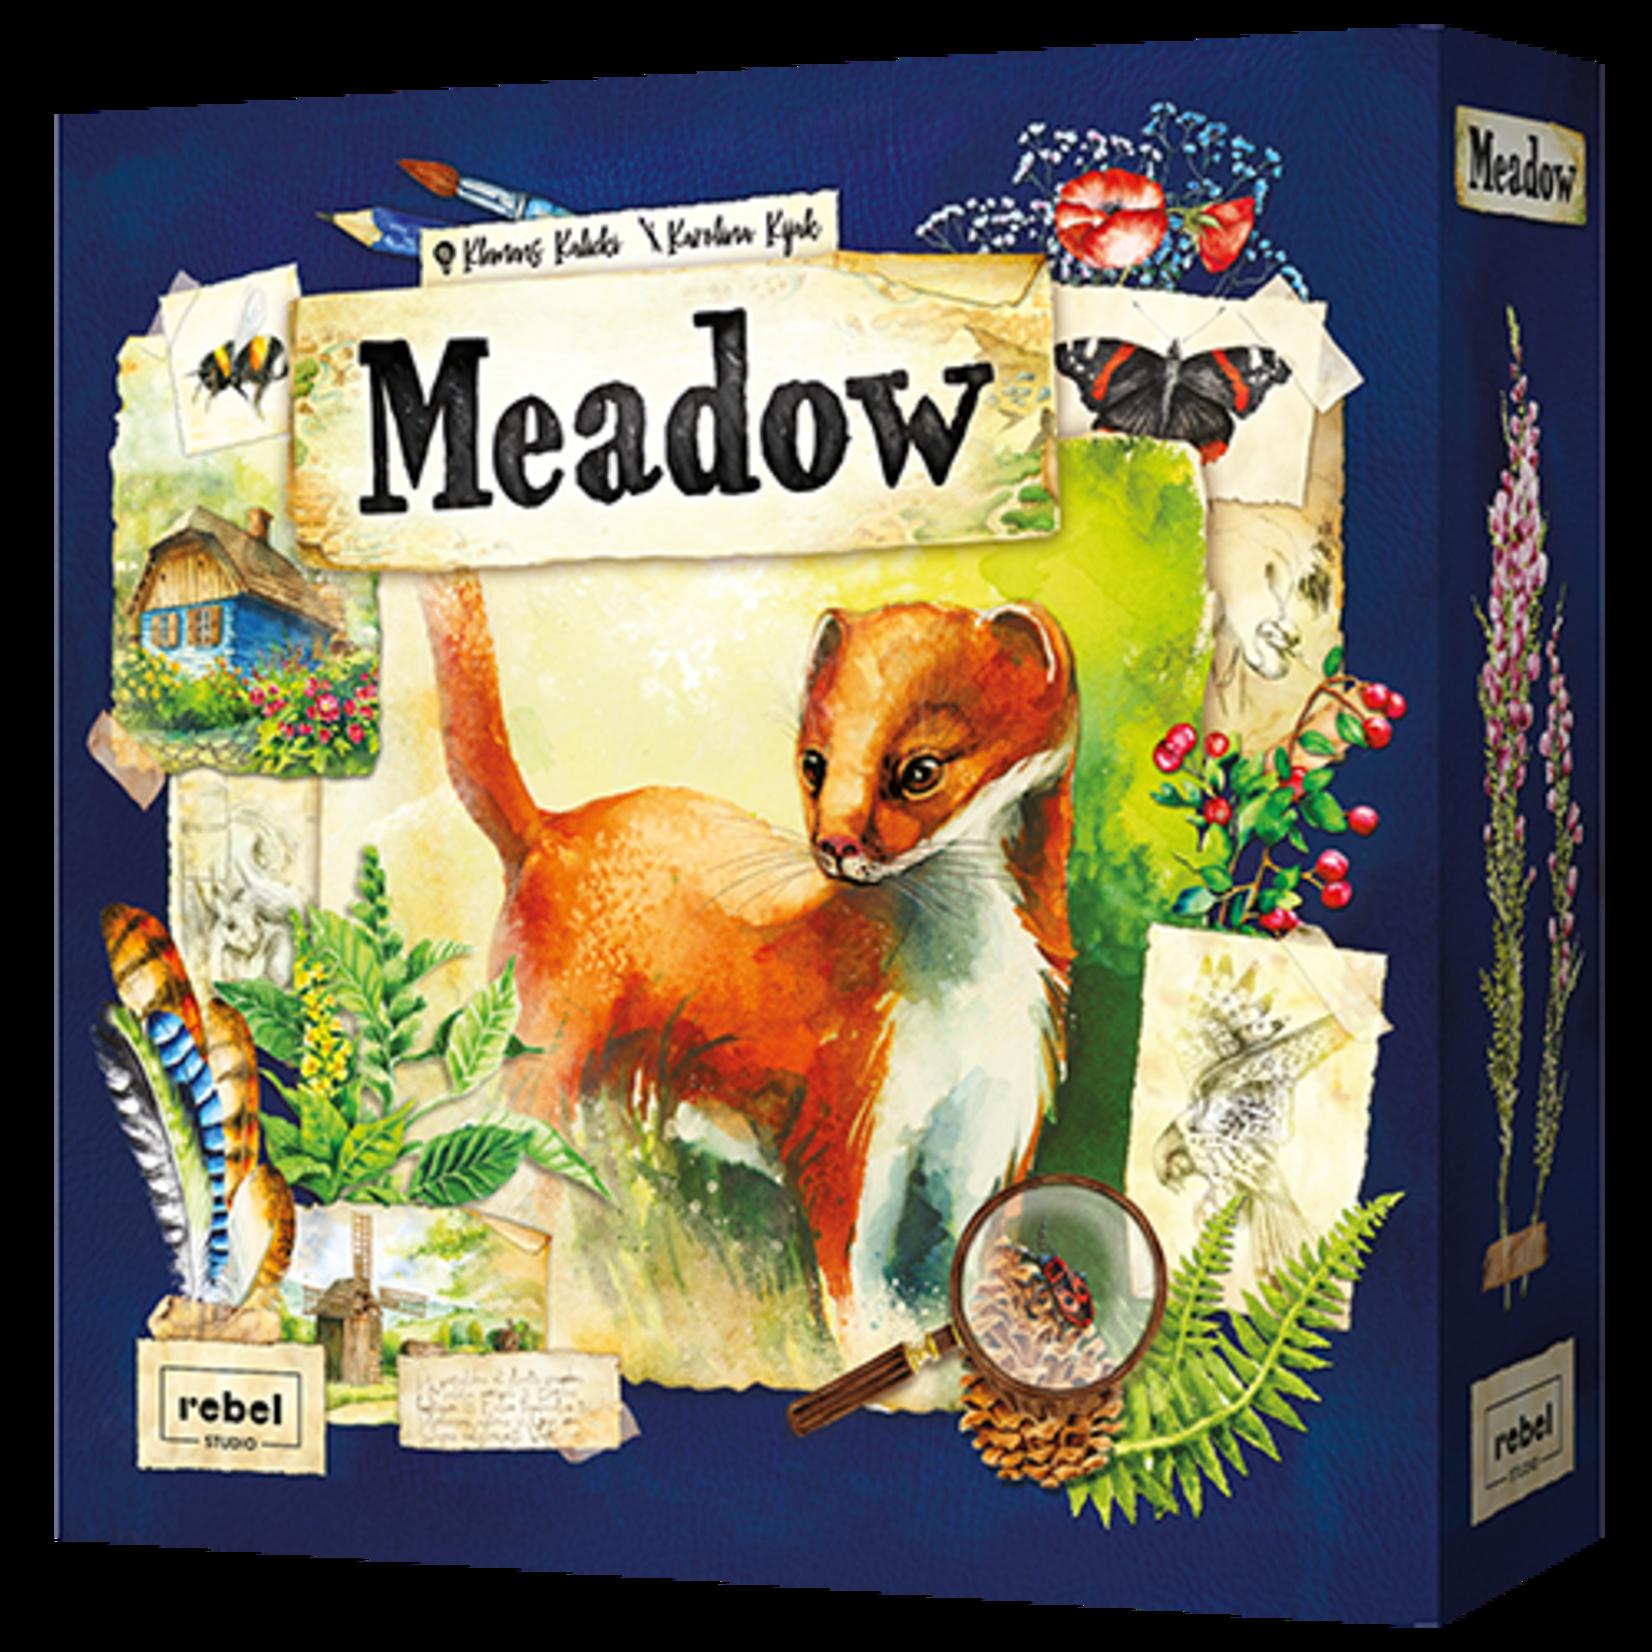 Rebel Meadow